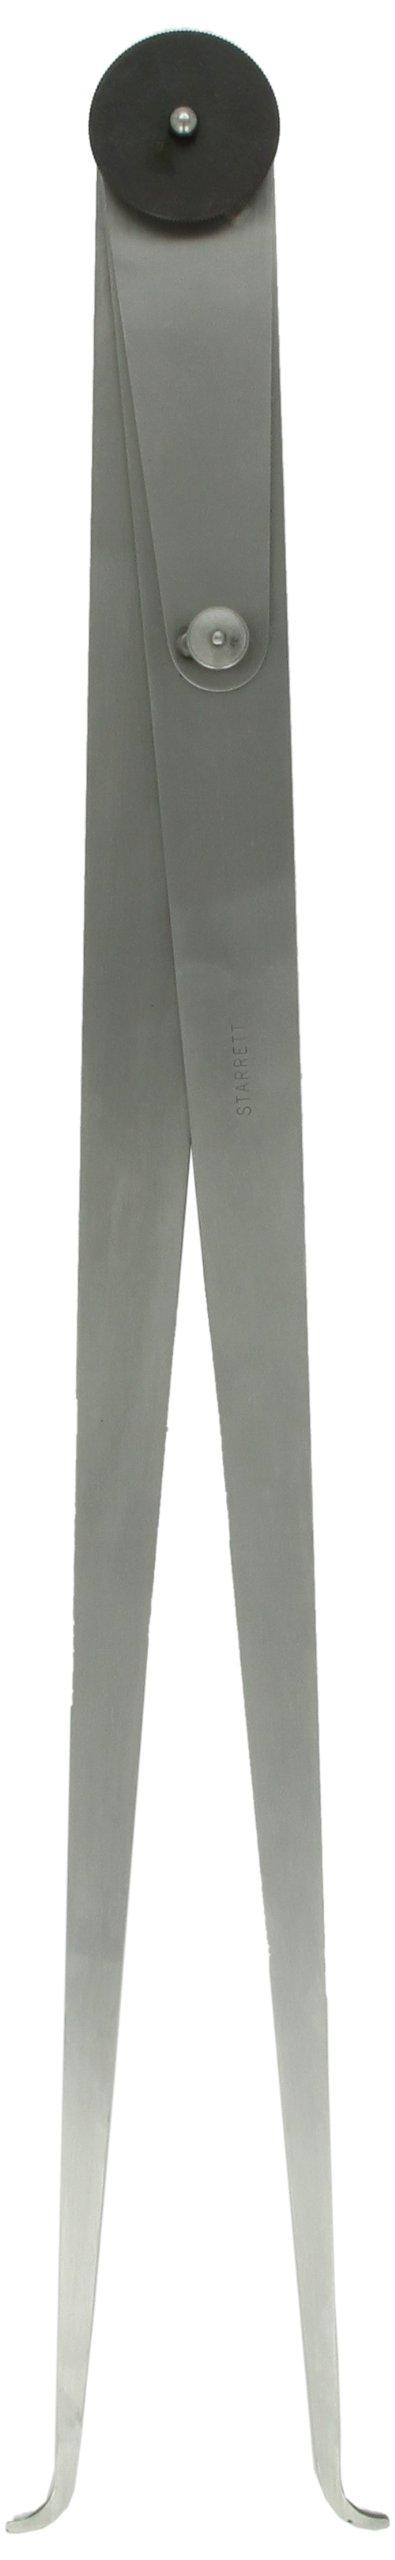 Starrett 37-24 Inside Joint Caliper, Steel, Flat Leg, 0-24'' Range